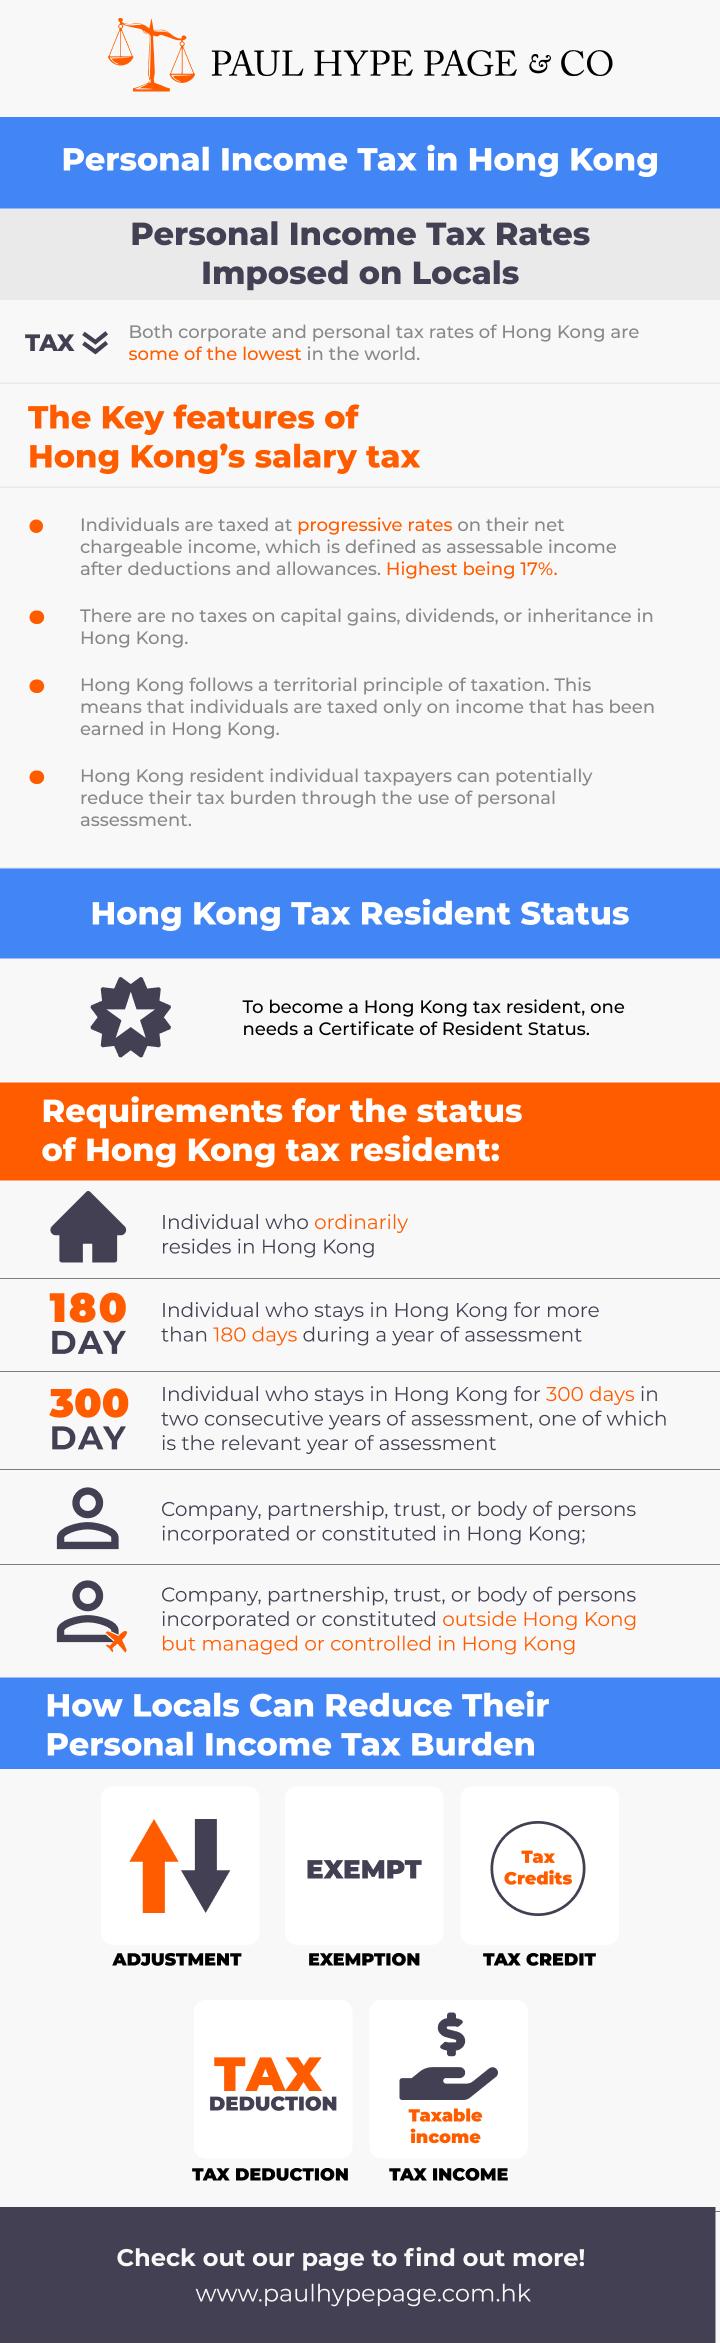 Hong Kong Personal Income Tax